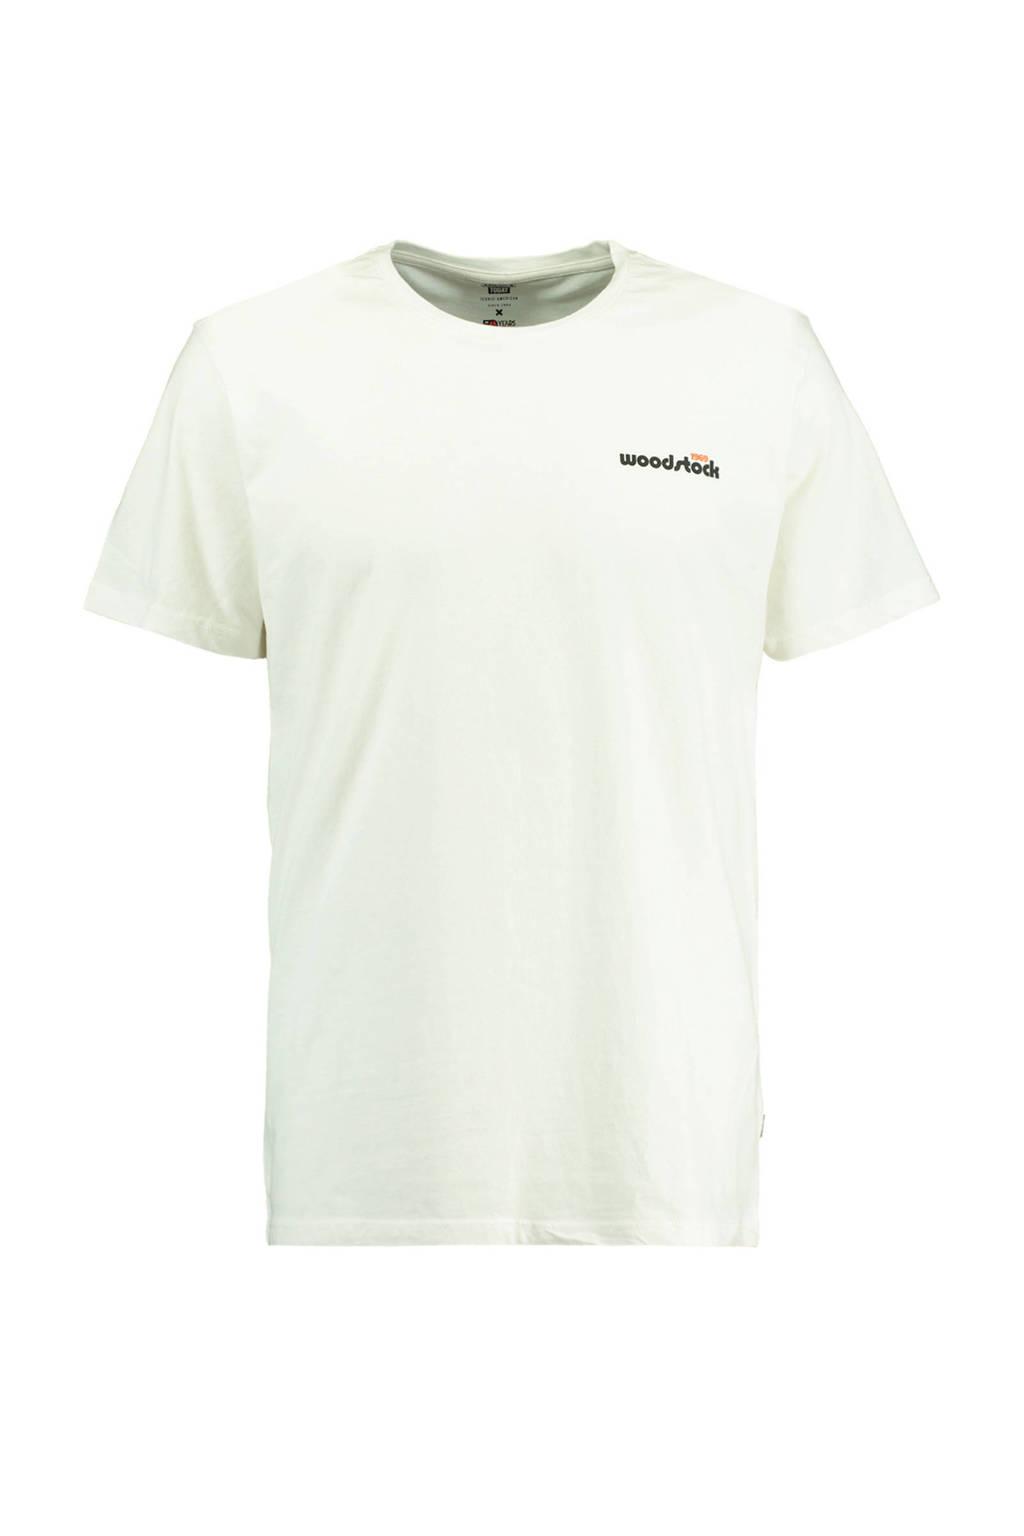 America Today T-shirt met printopdruk, Wit